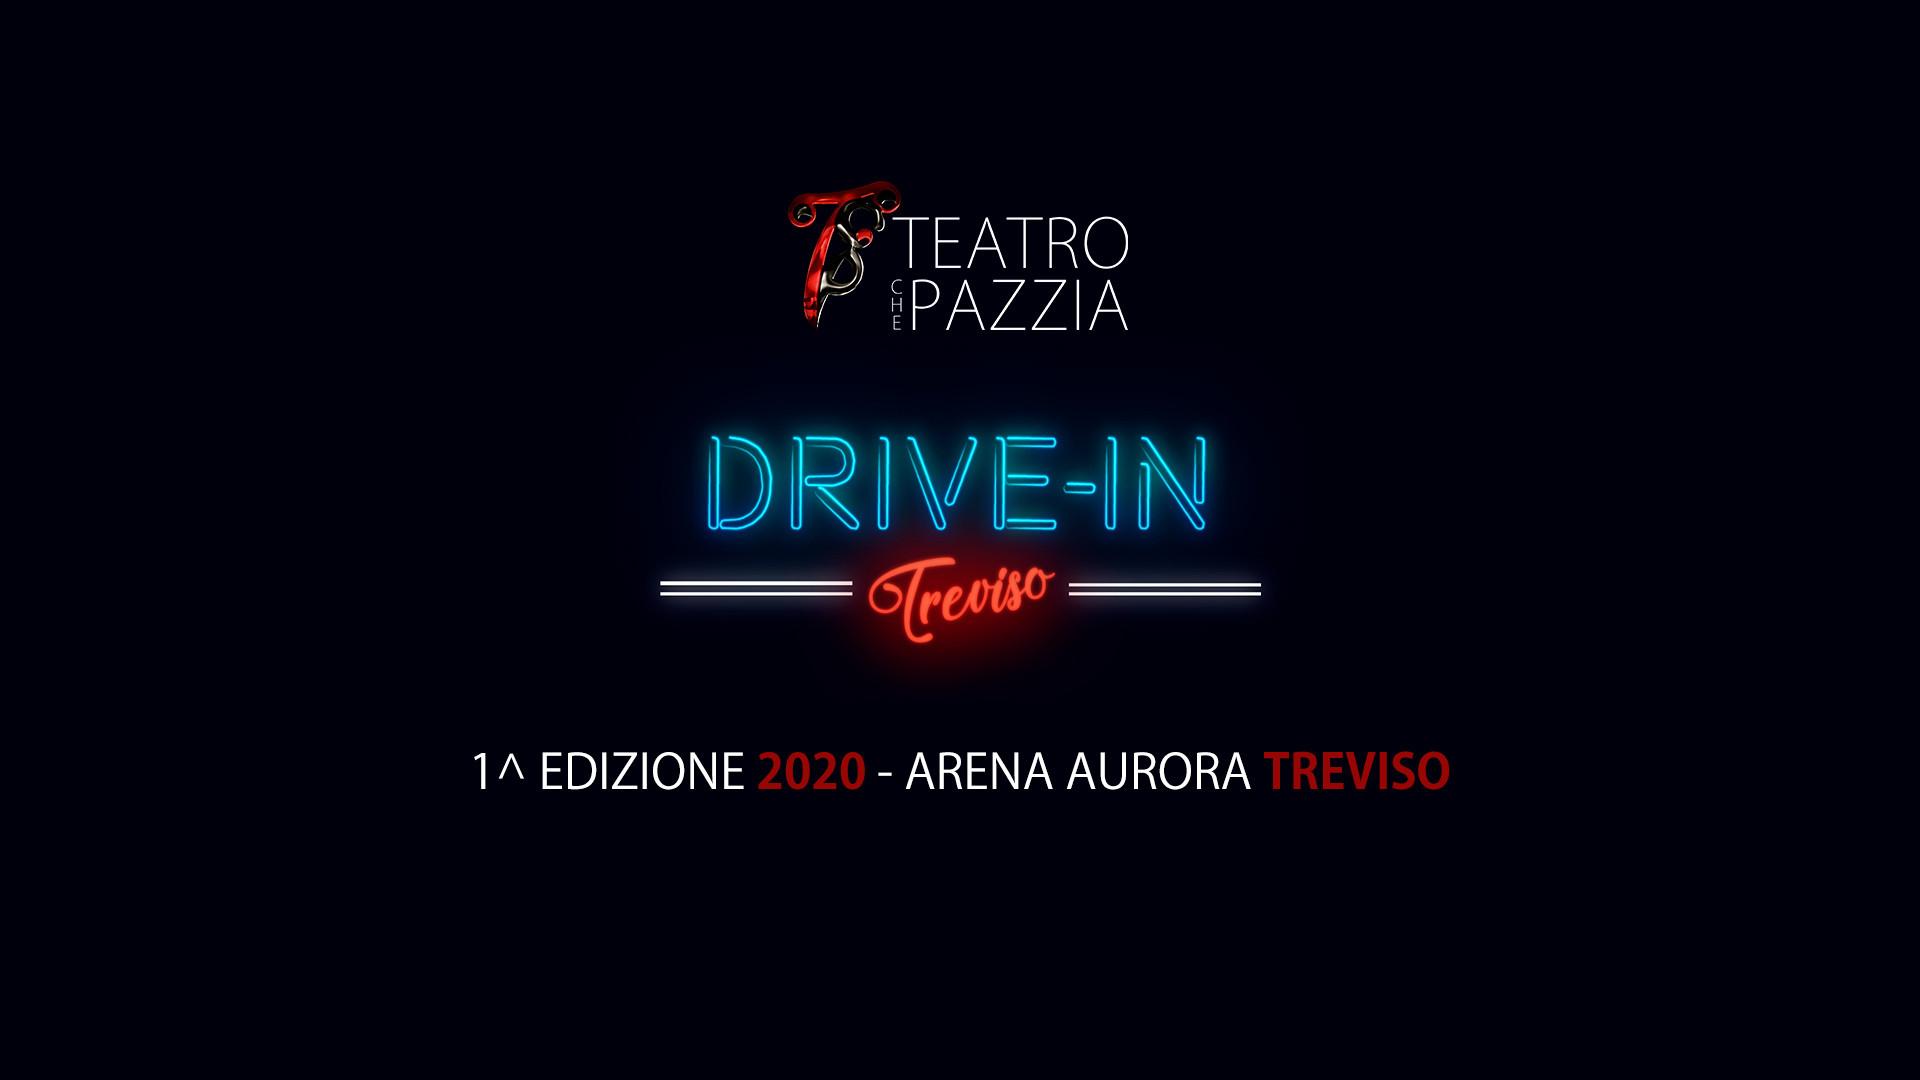 Rassegne_ed_Eventi_Treviso_drive-in.jpg